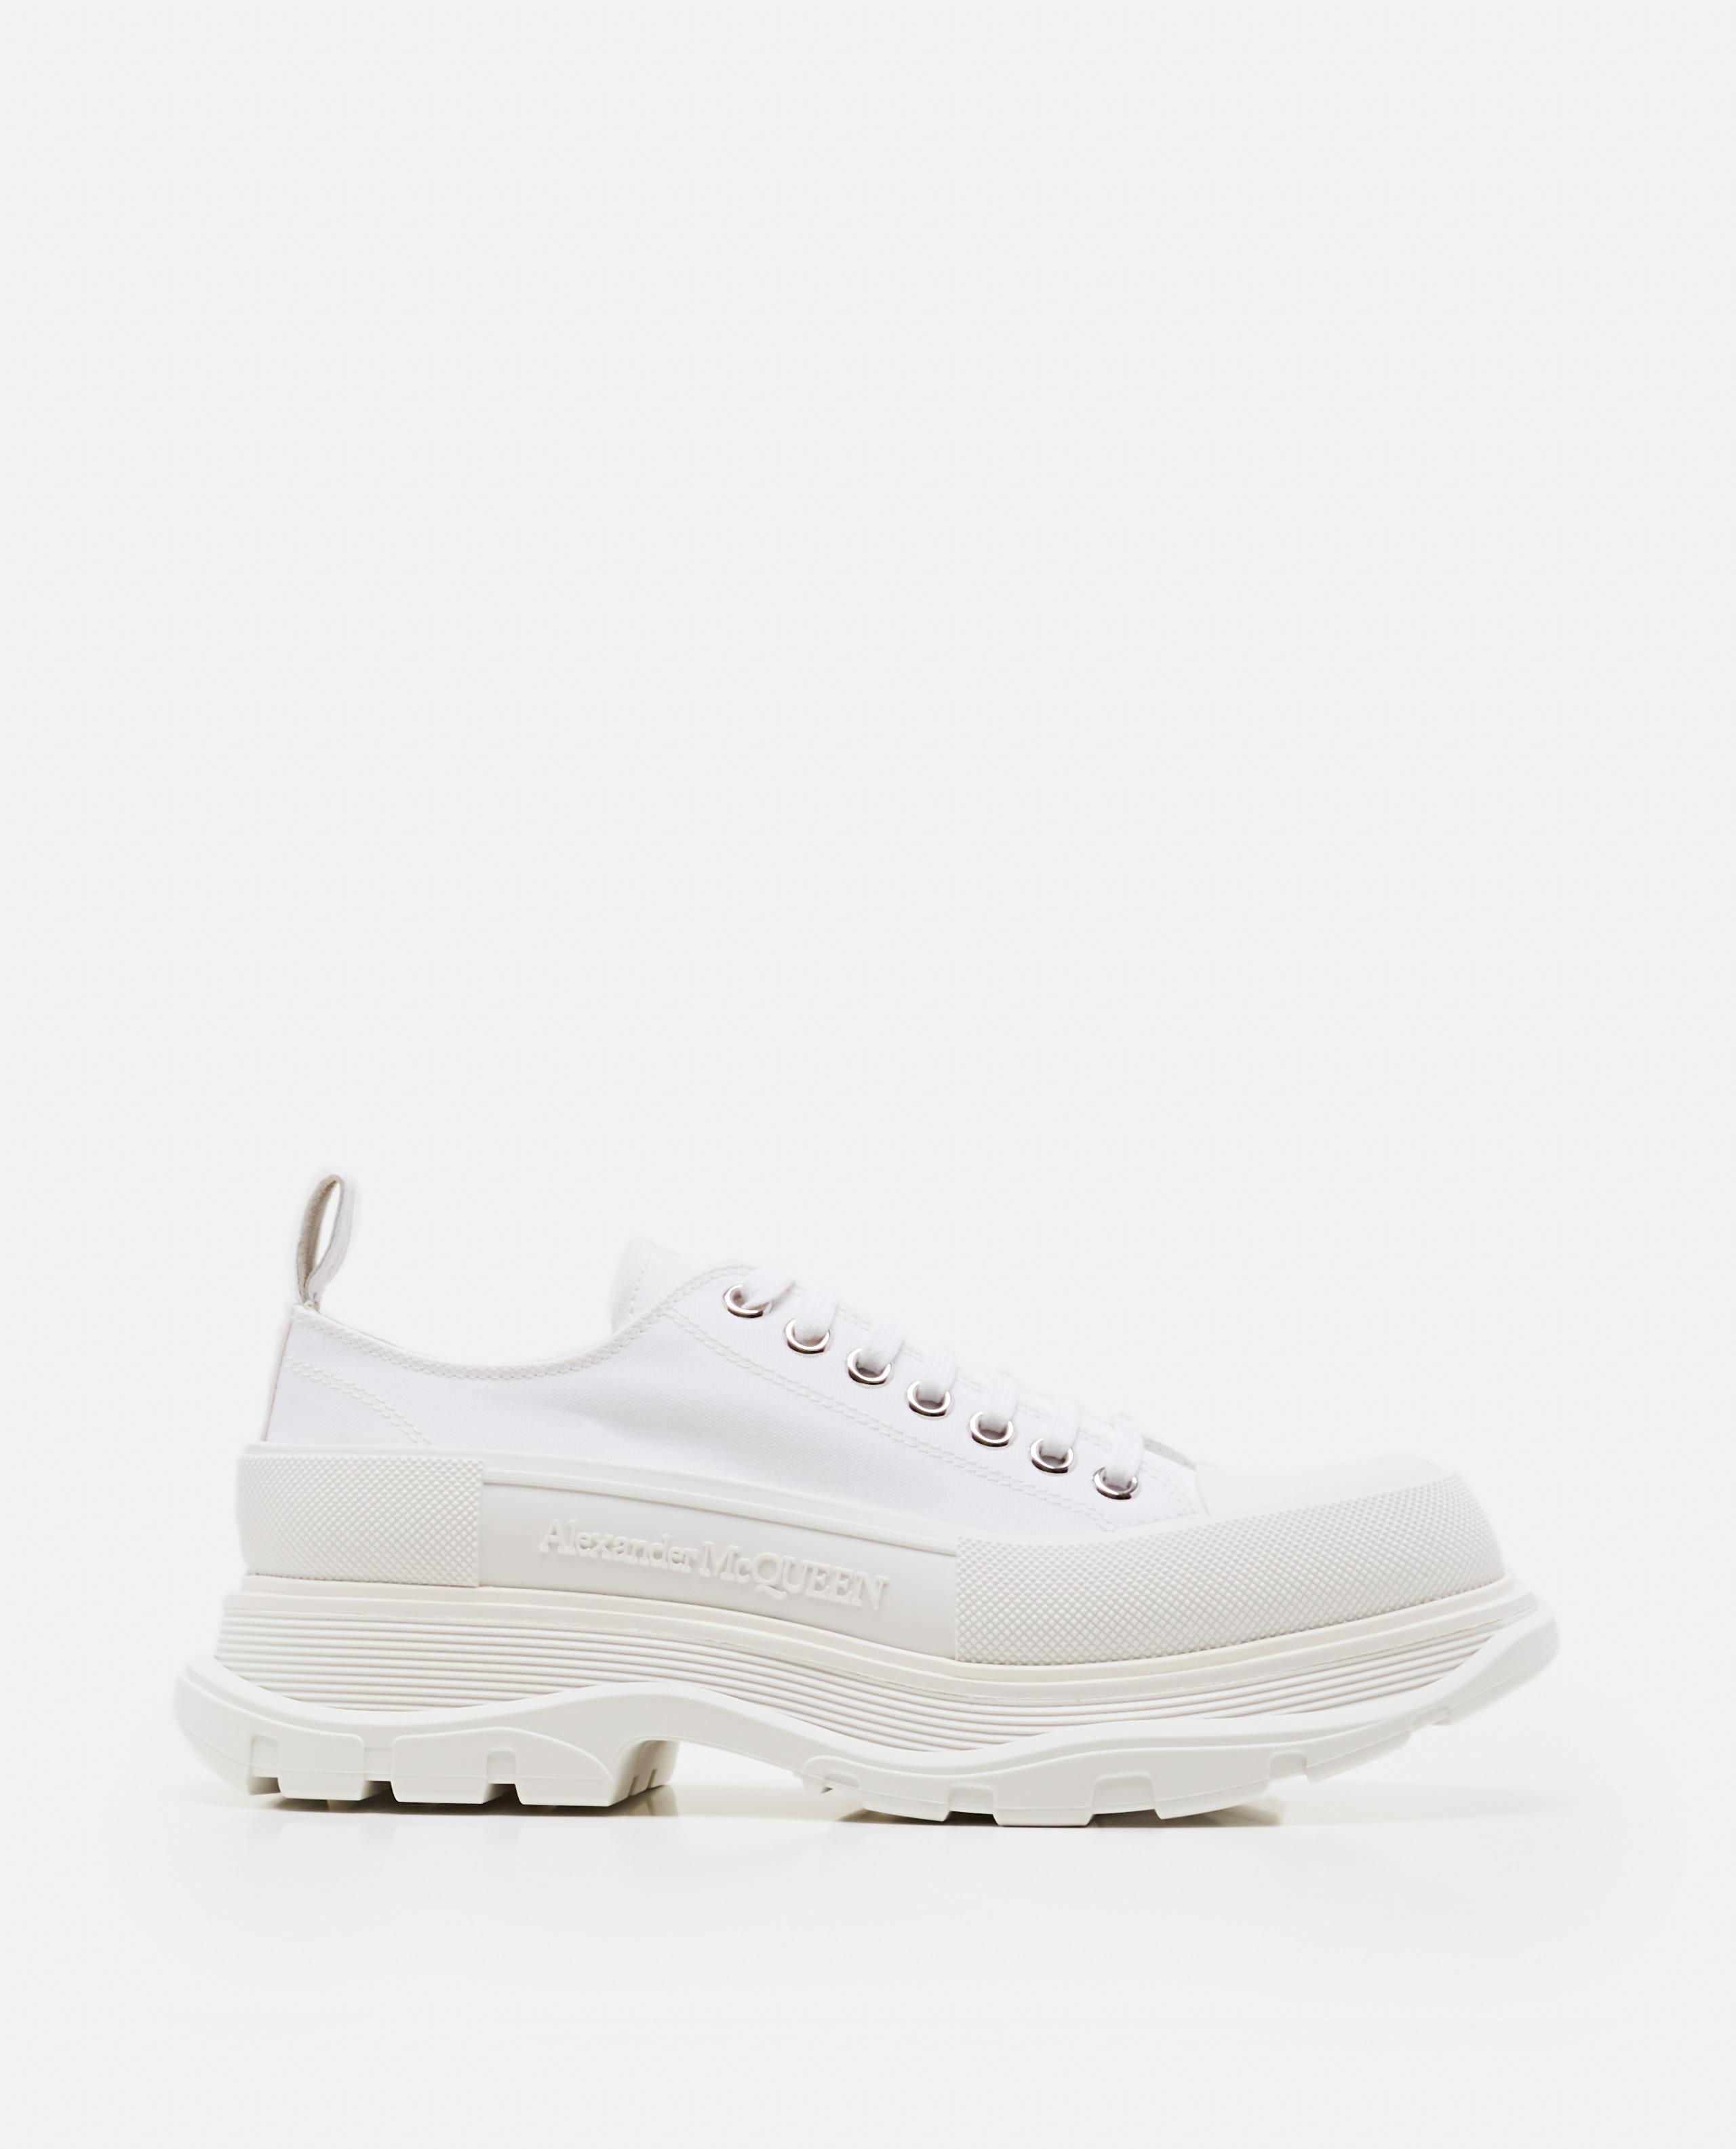 'Tread slick' sneaker